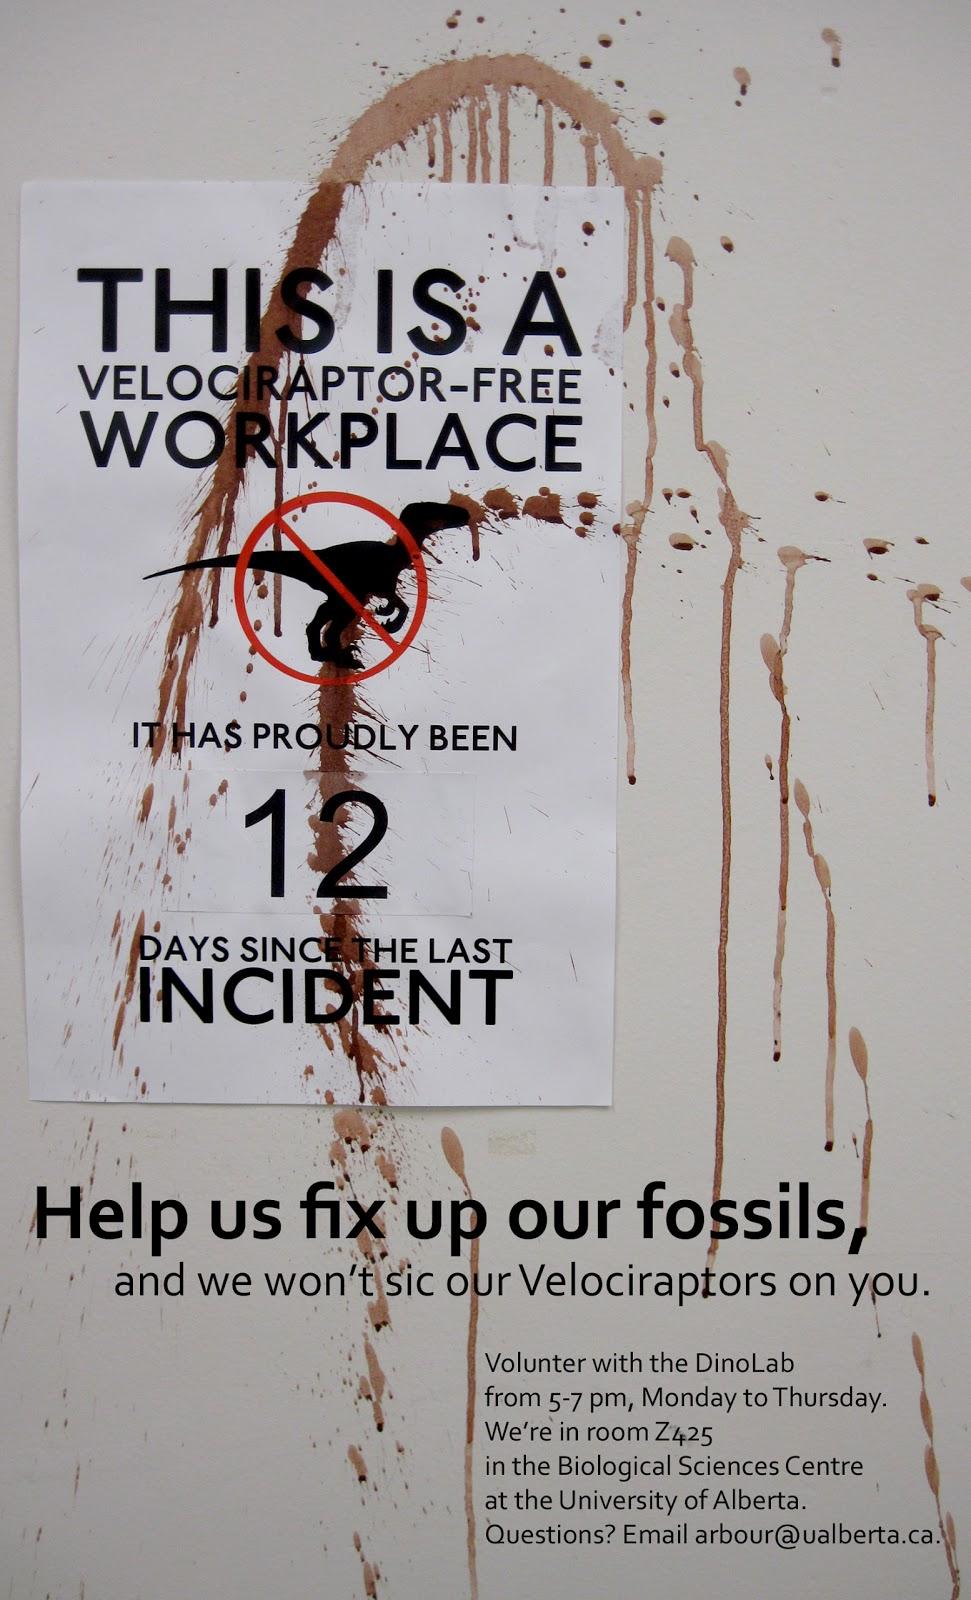 Velociraptor Free Mostly Pseudoplocephalus